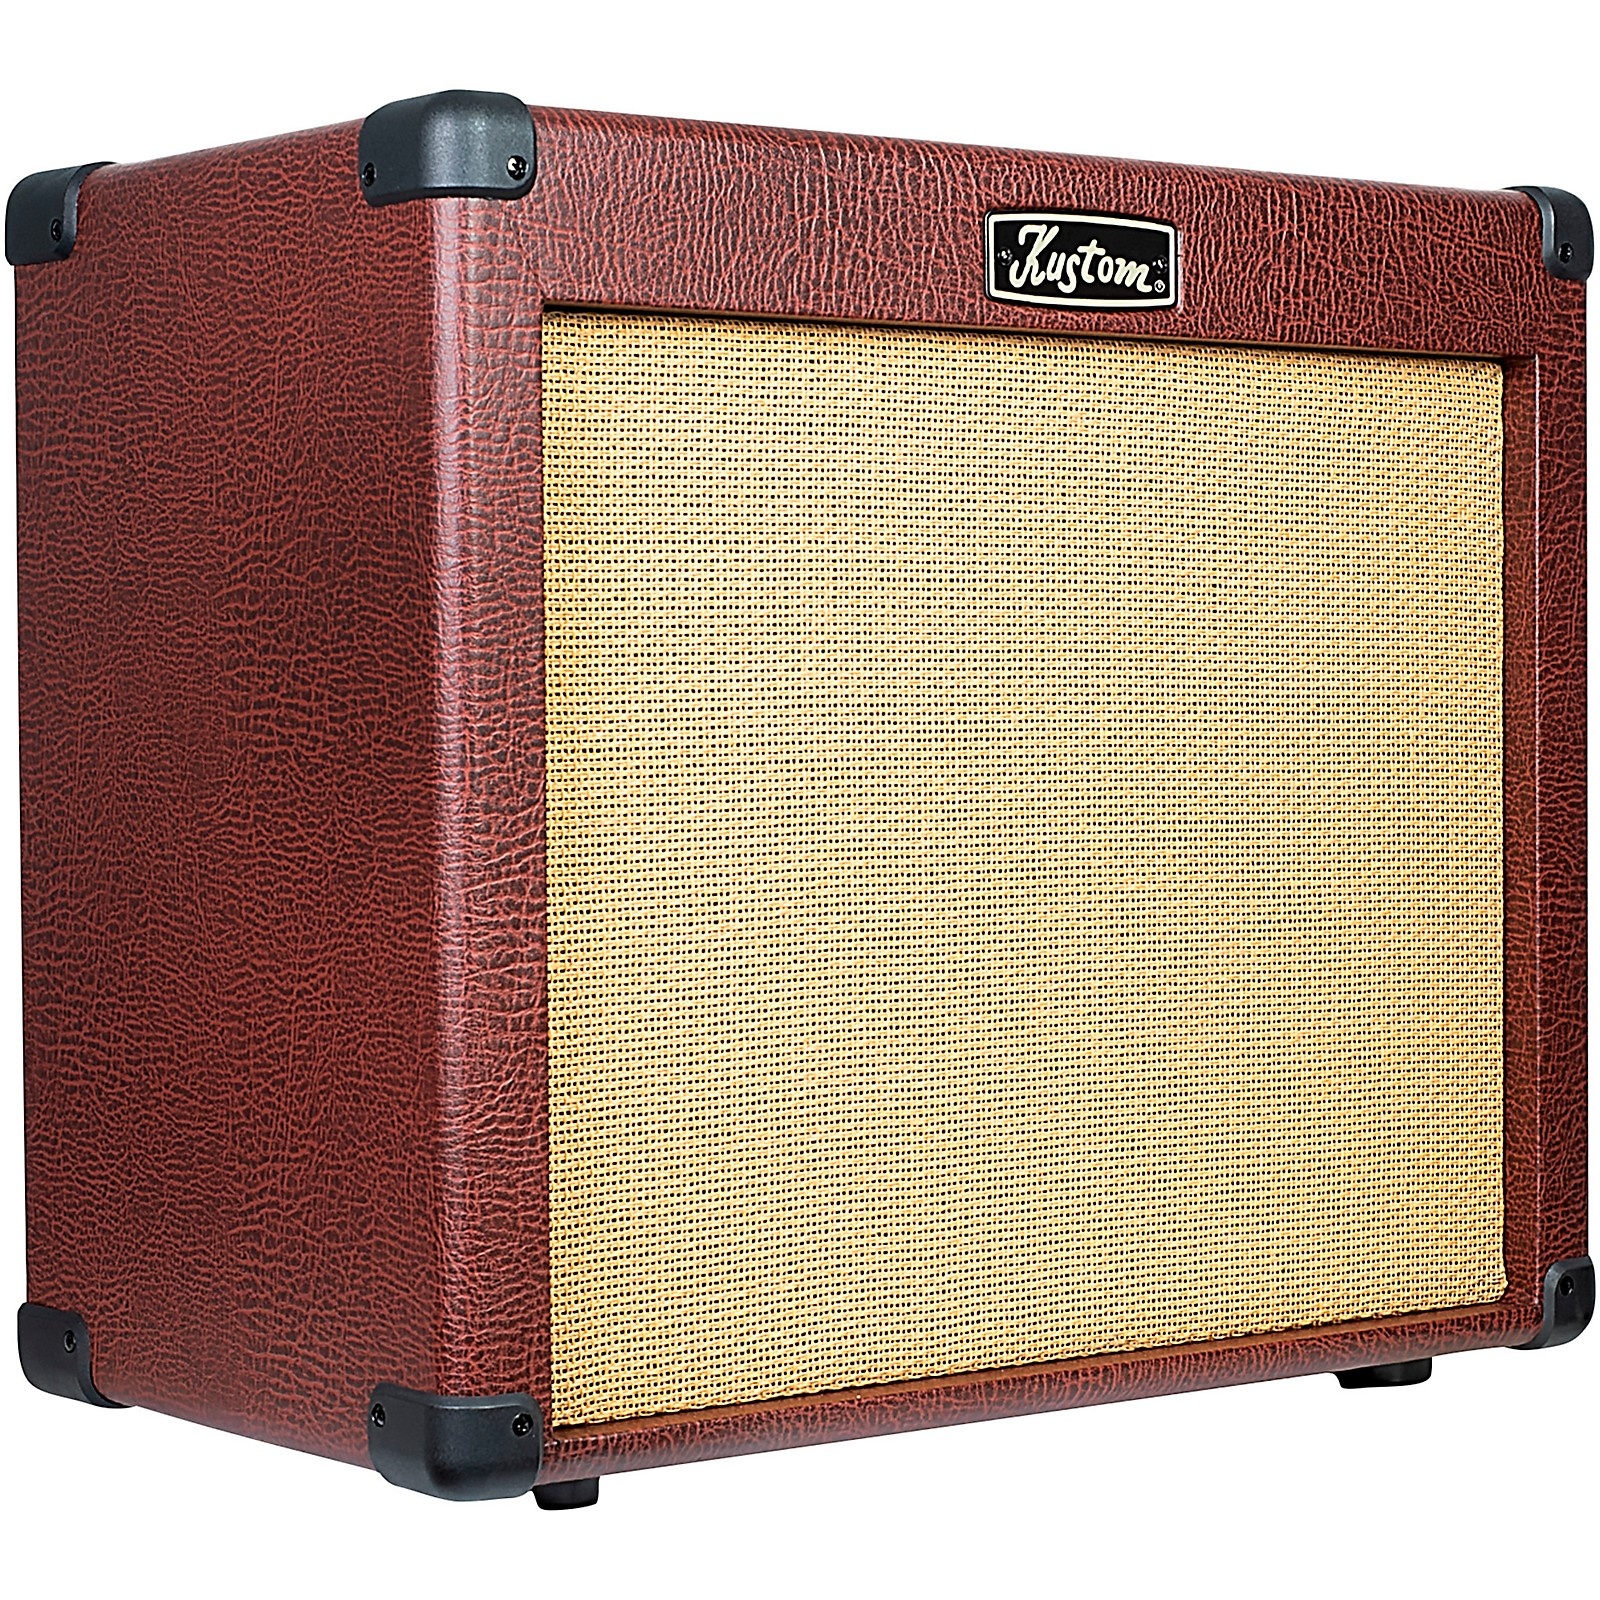 Open Box Kustom Sienna 65 Pro 65W 1x12 Acoustic Guitar Combo Amp